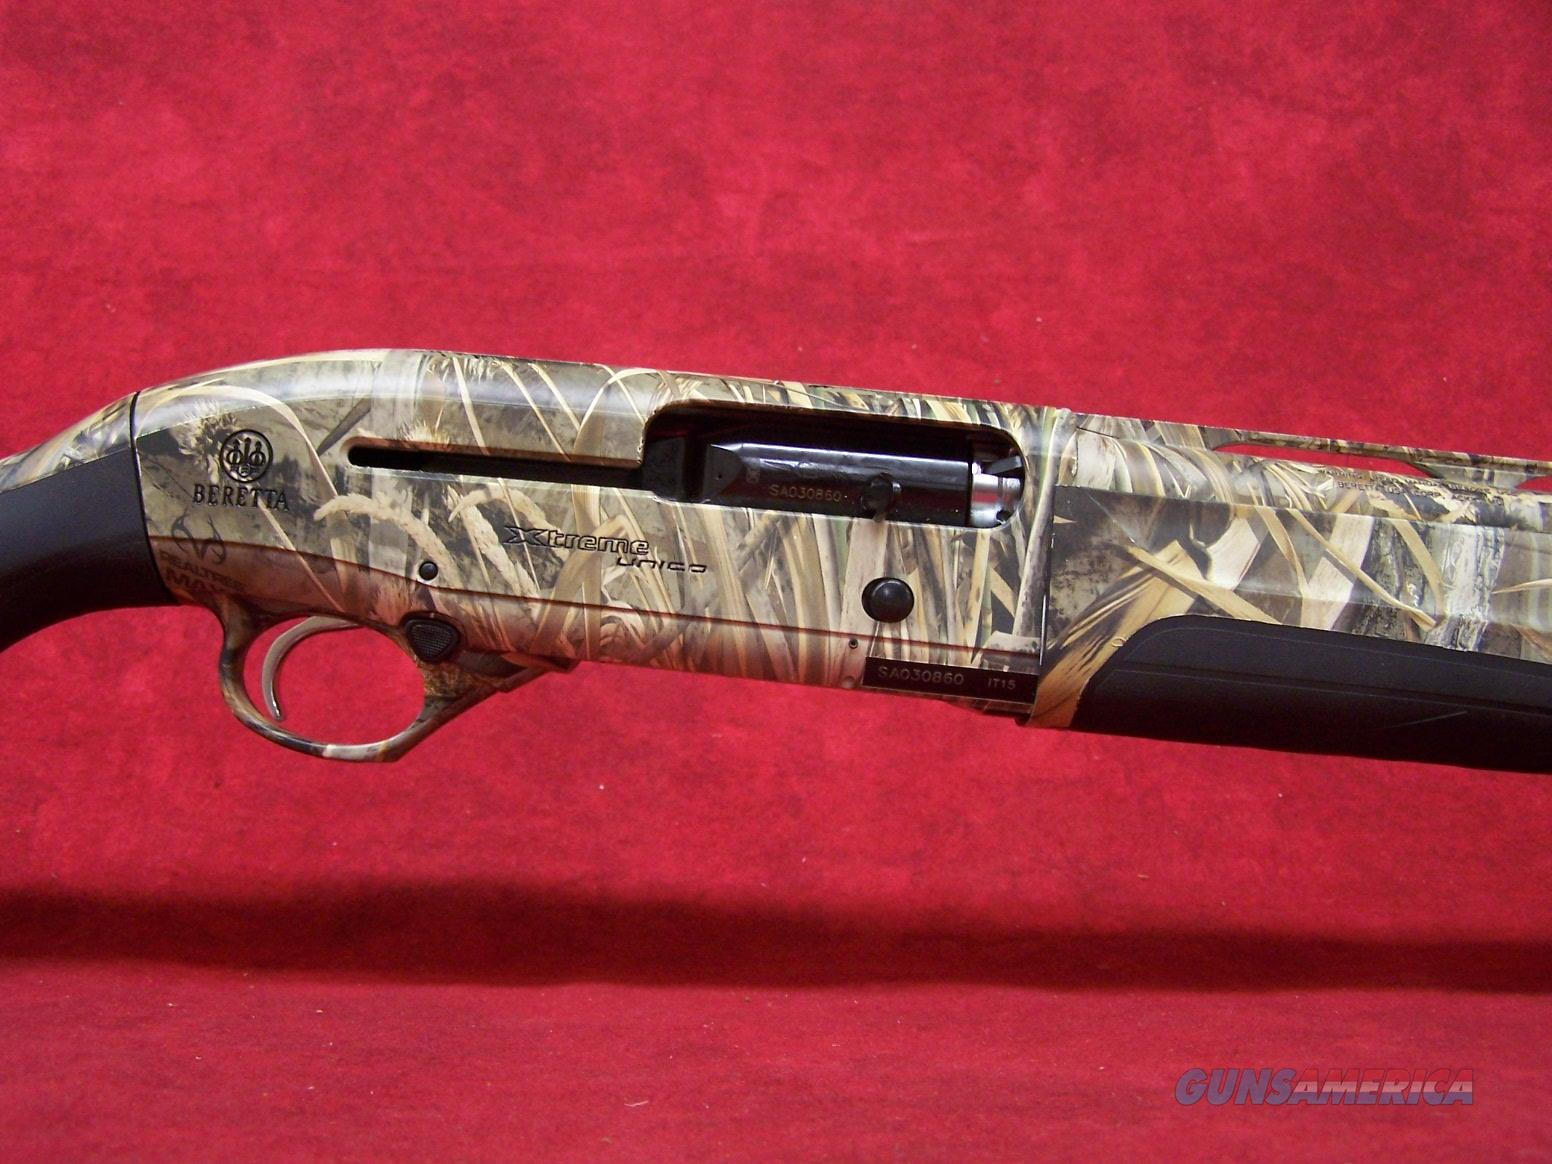 "Beretta A400 Xtreme 12ga 3.5"" Realtree Max-5 w/ Kick-Off  28""   Guns > Shotguns > Beretta Shotguns > Autoloaders > Hunting"